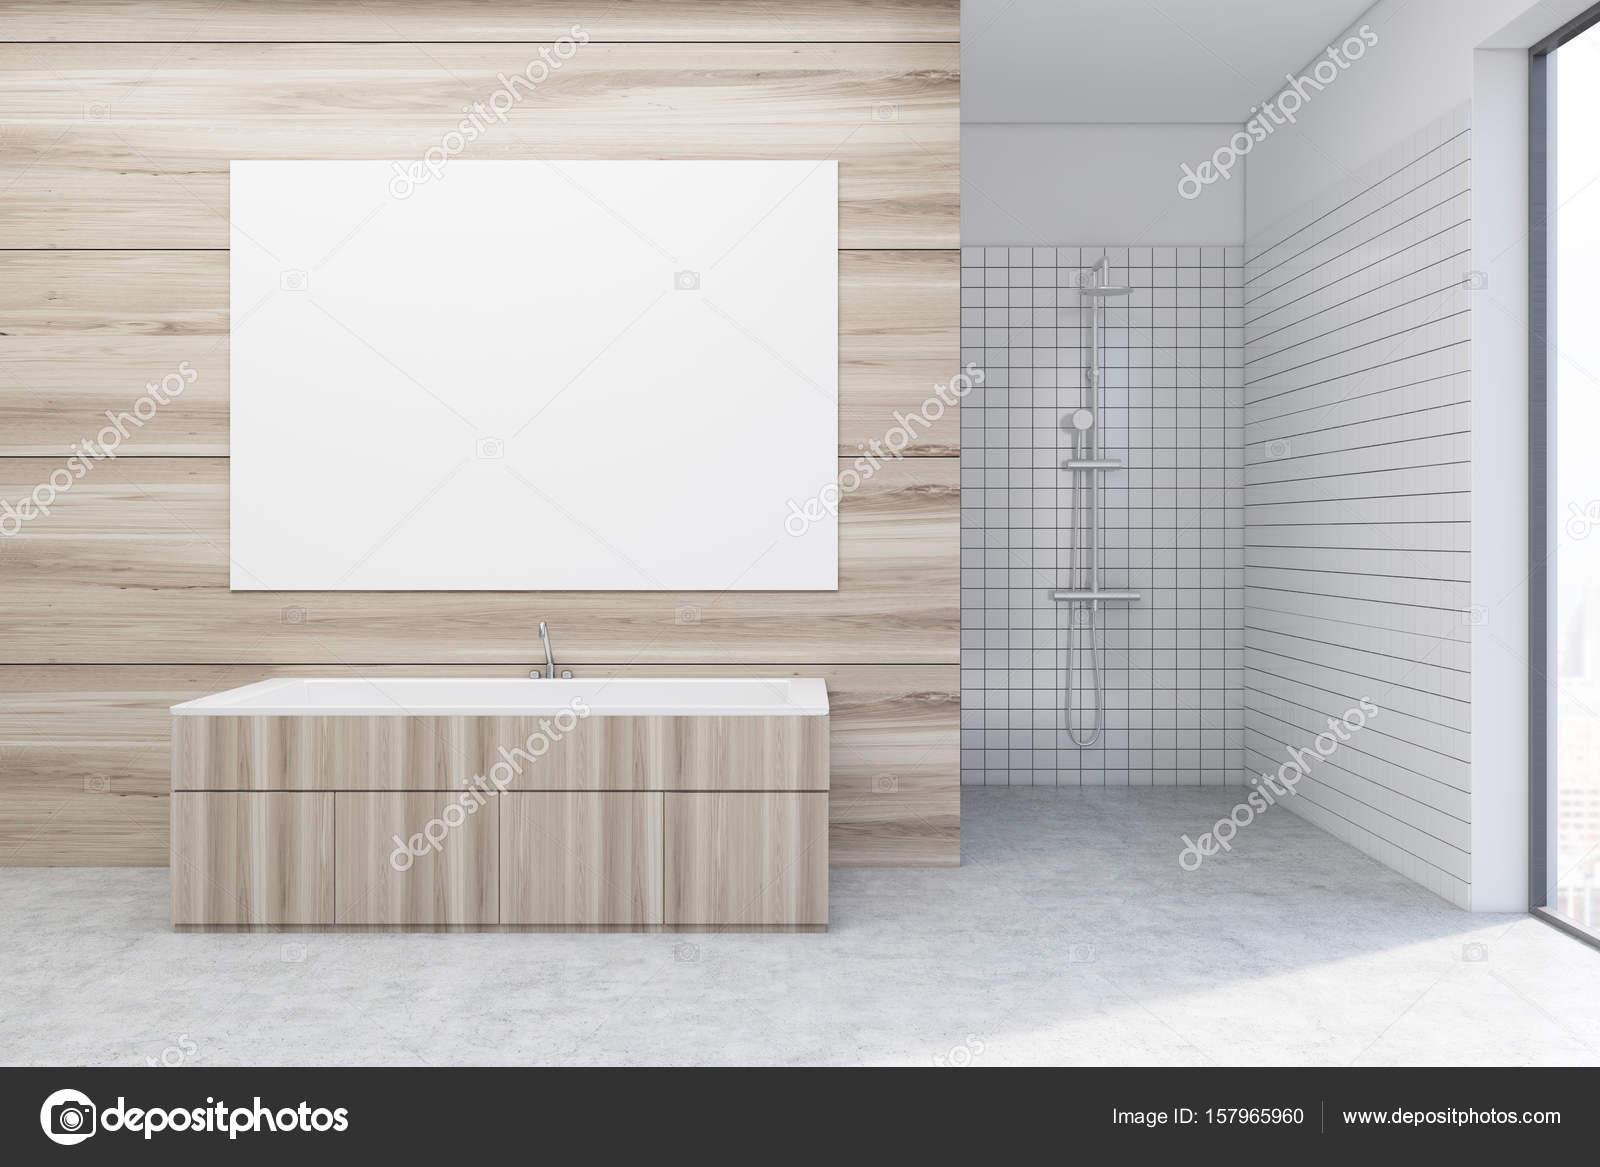 Bagno in legno doccia poster u foto stock denisismagilov